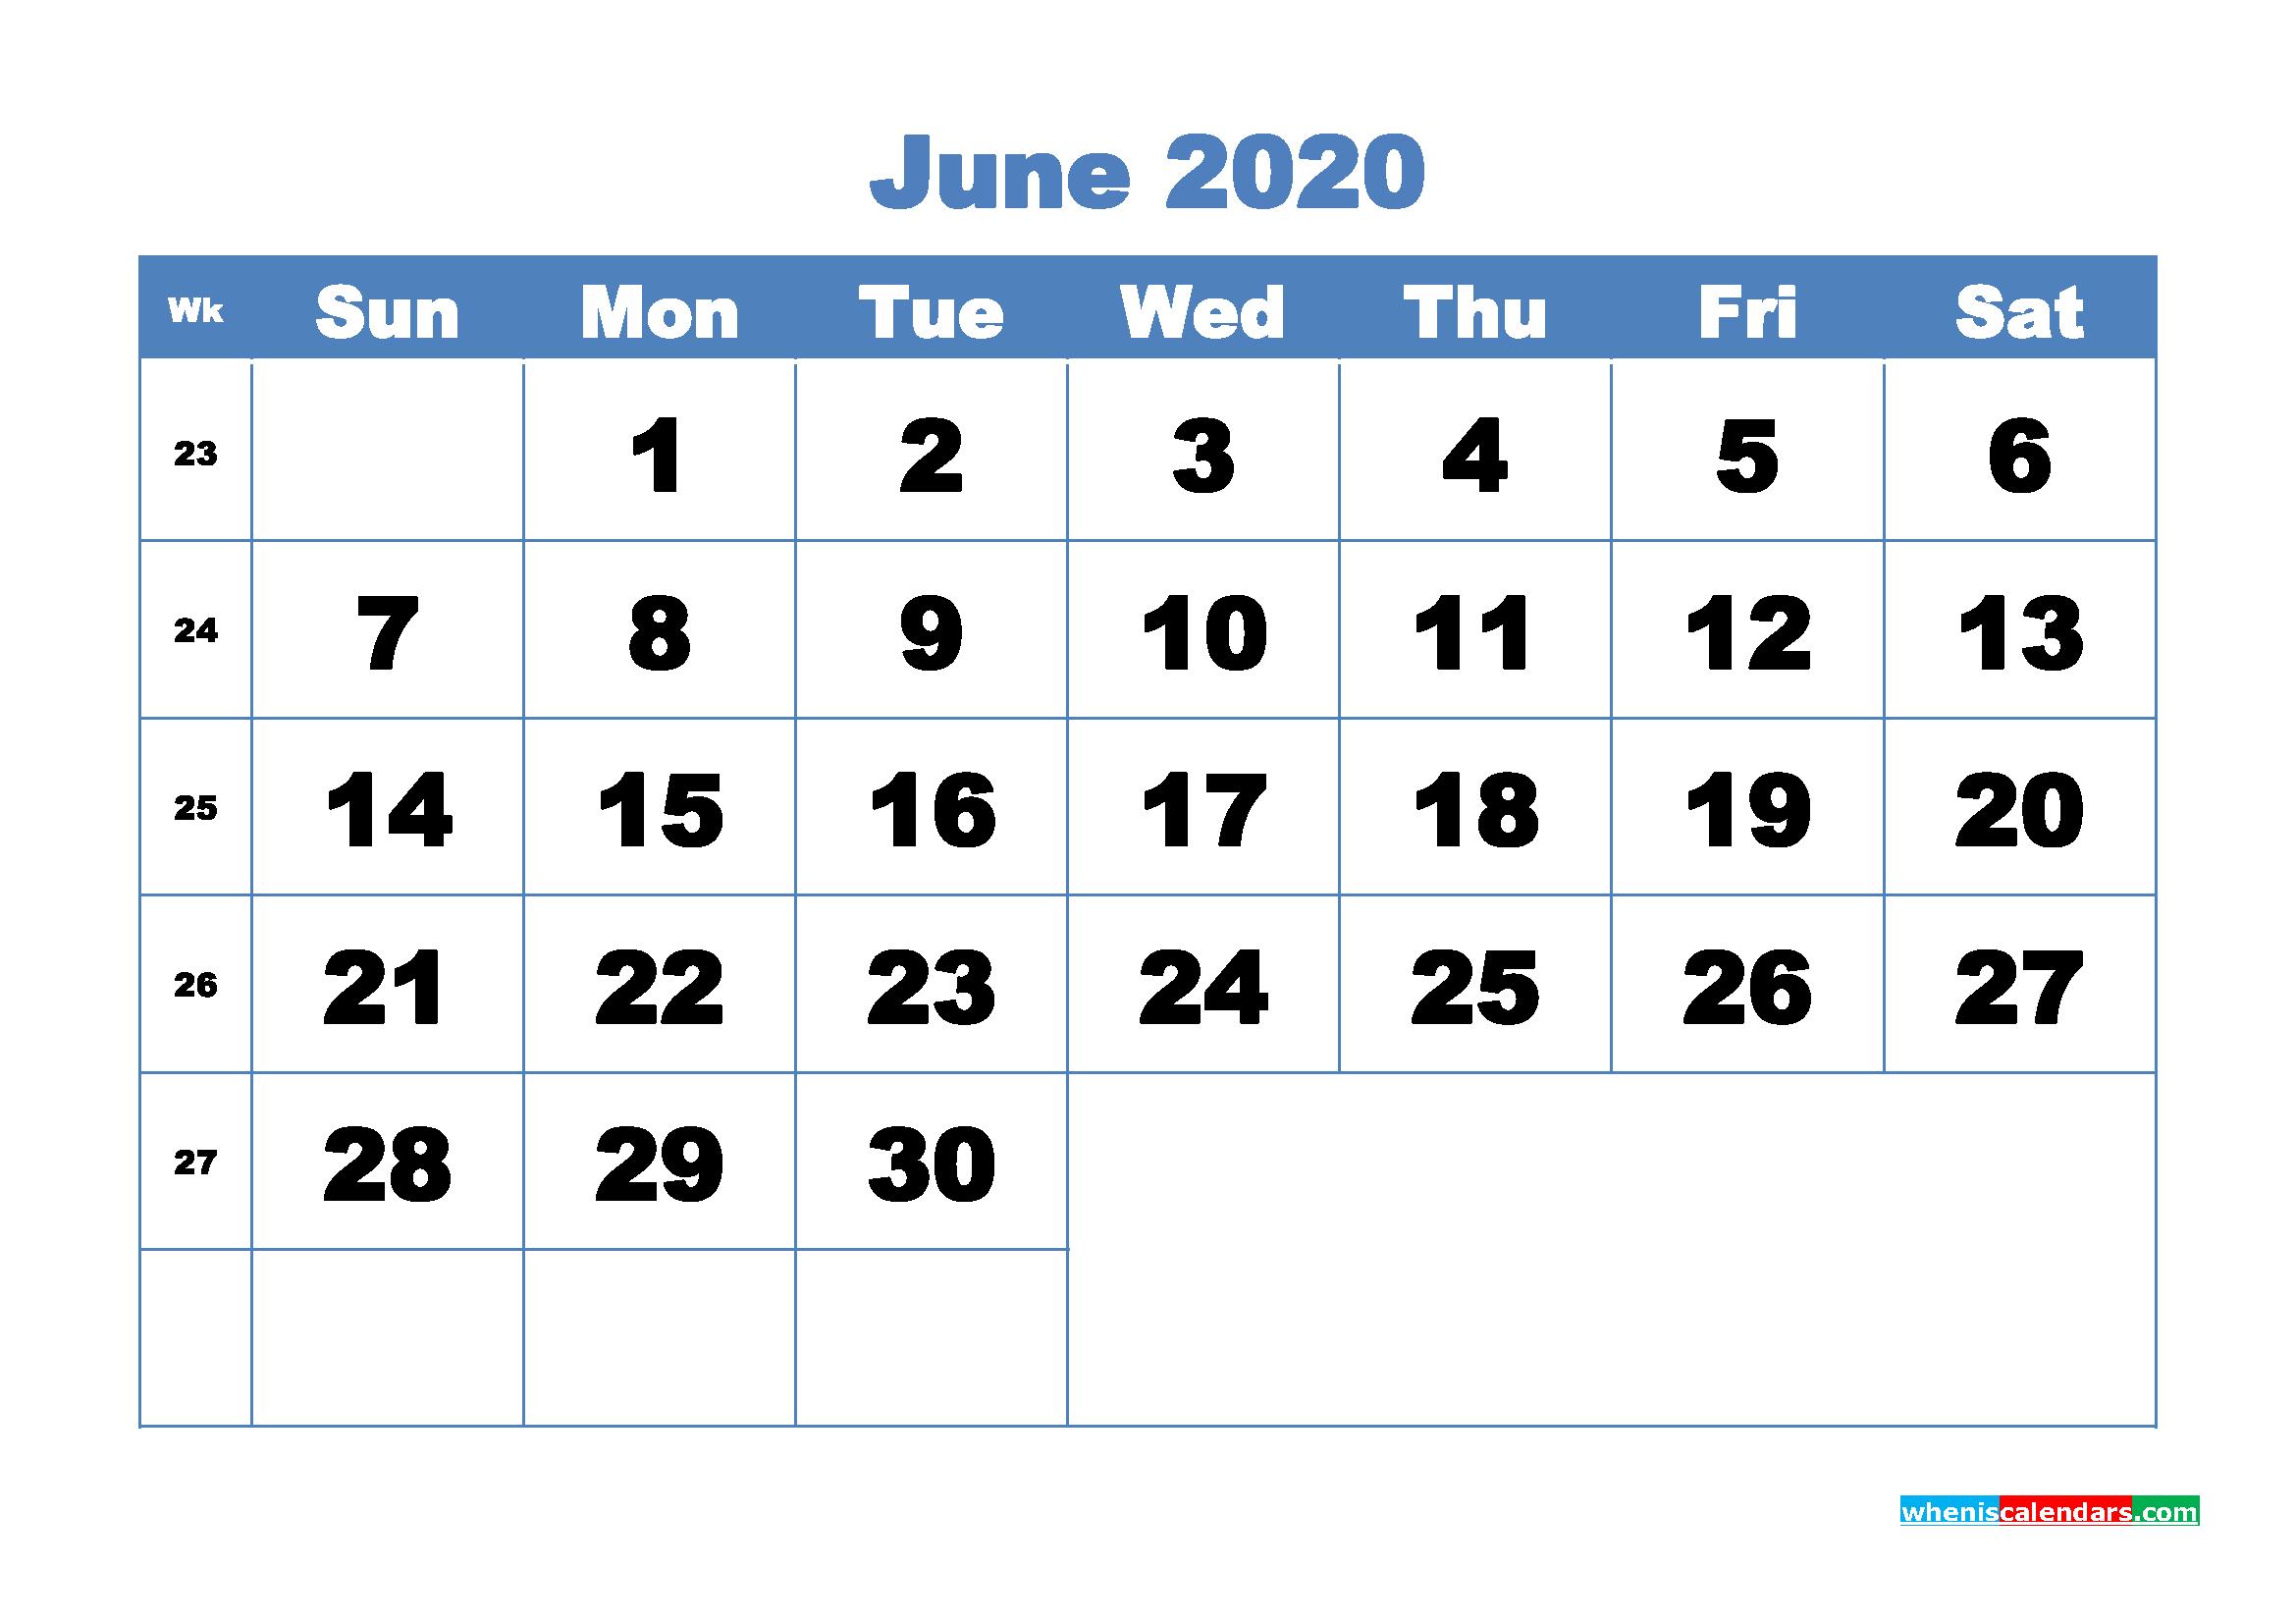 June Printable Calendar 2020 PDF, Word - No.m20b306